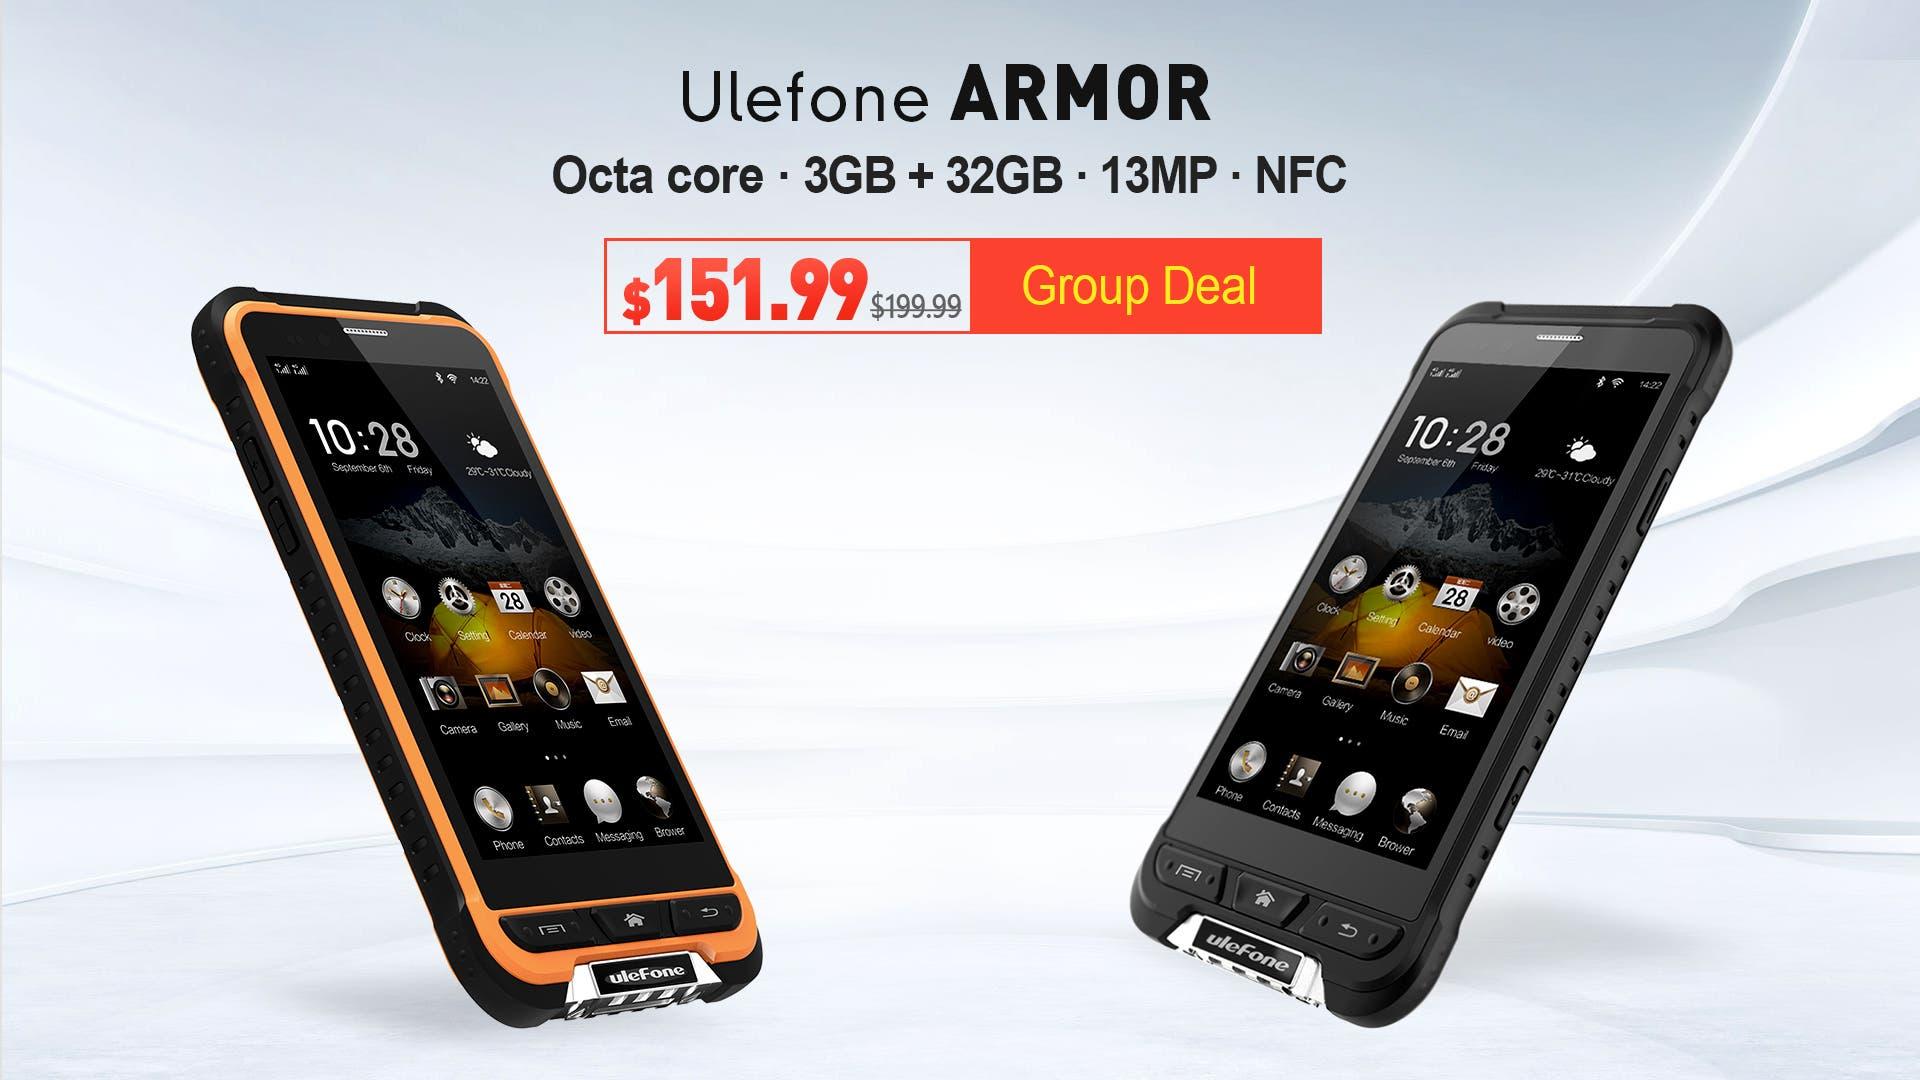 Ulefone Armor Group Deal